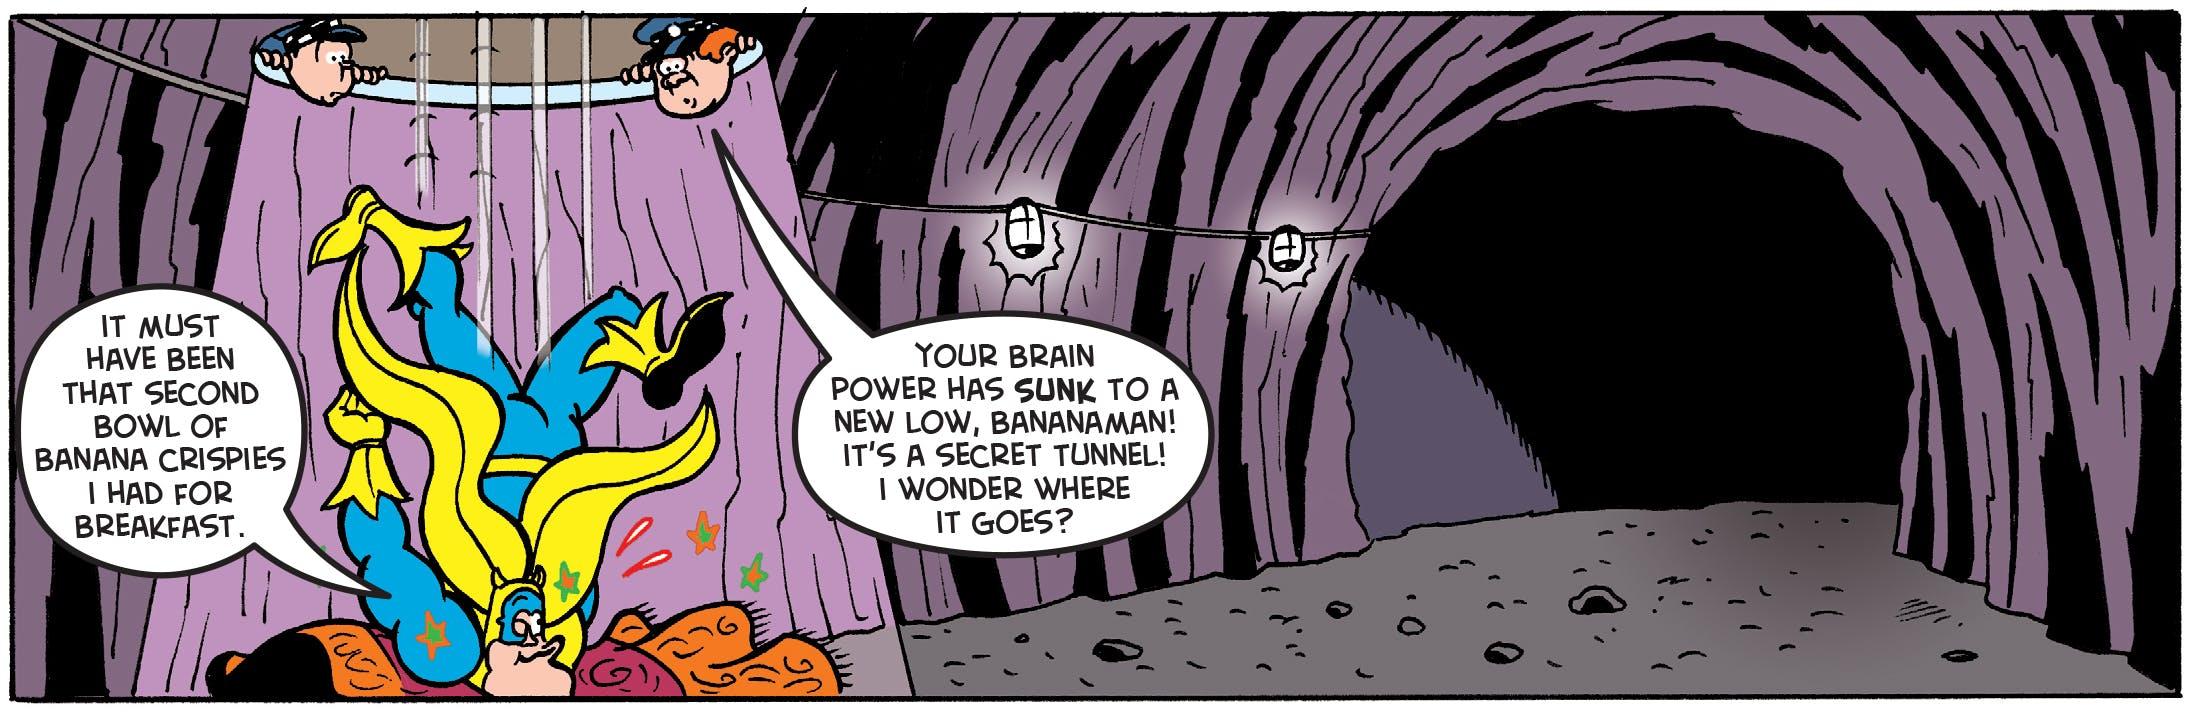 Bananaman digs deeps into the criminal underworld.